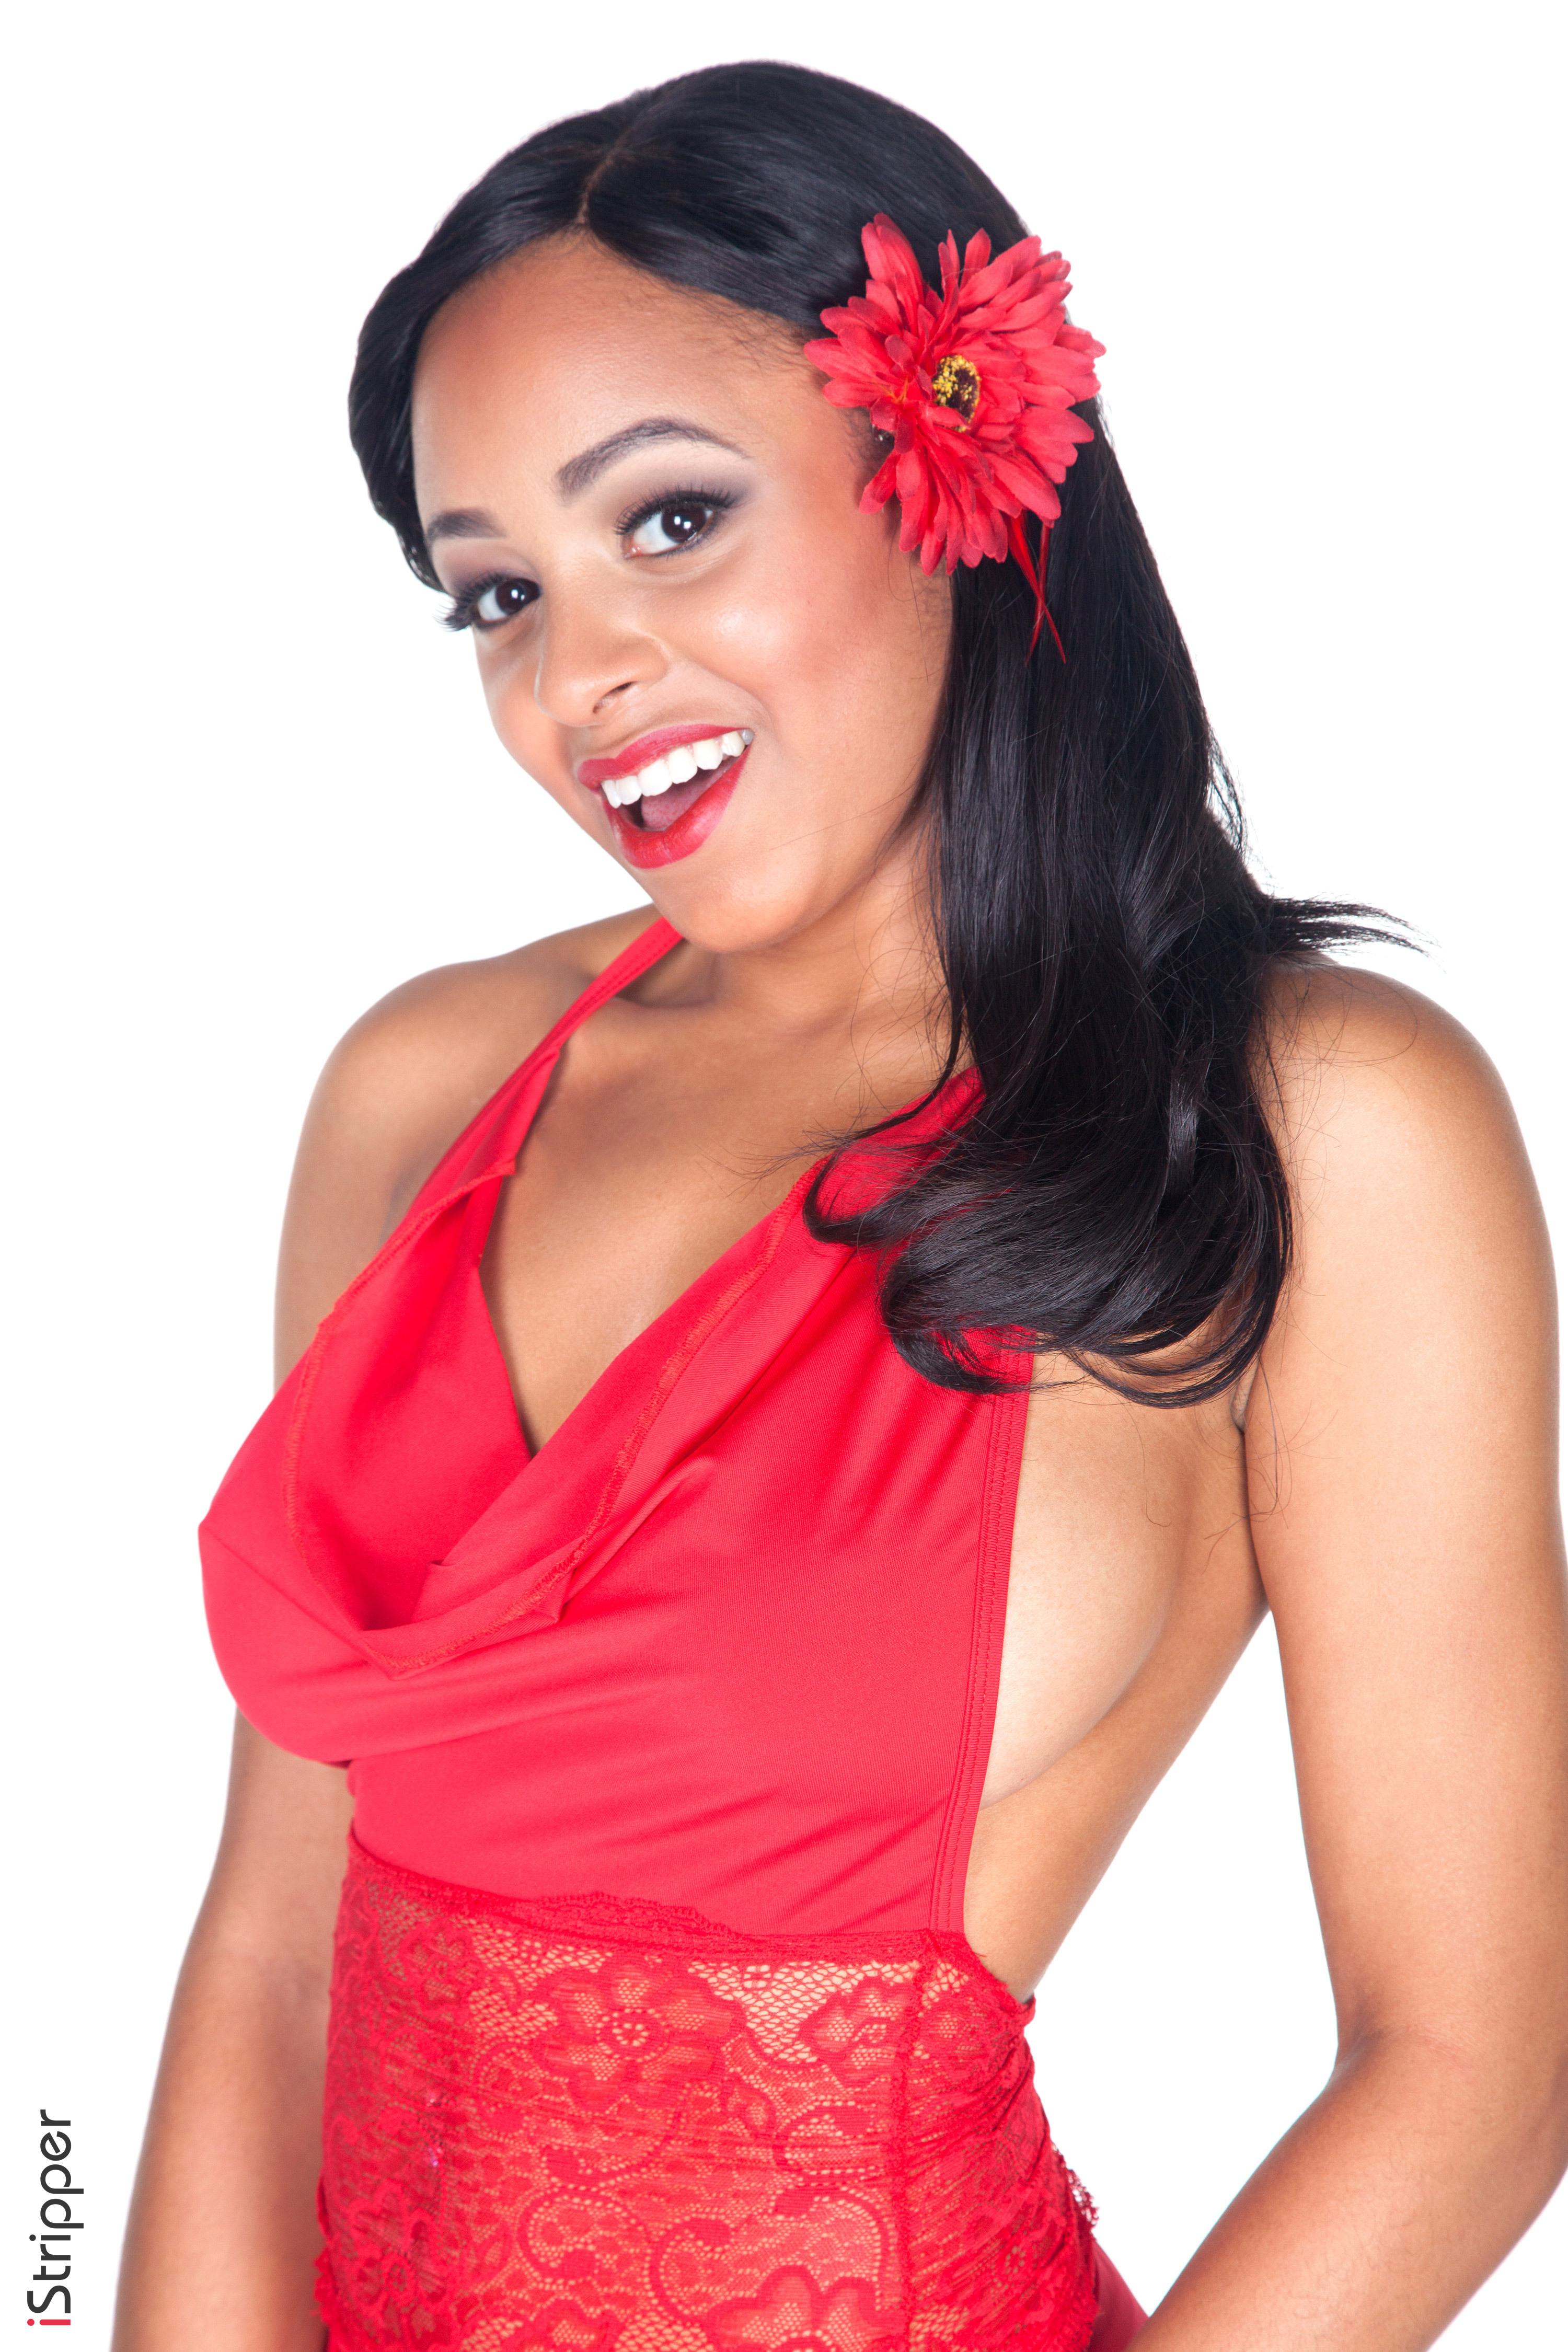 Anya Ivy Crimson Peak nude backgrounds - Erotic Wallpapers